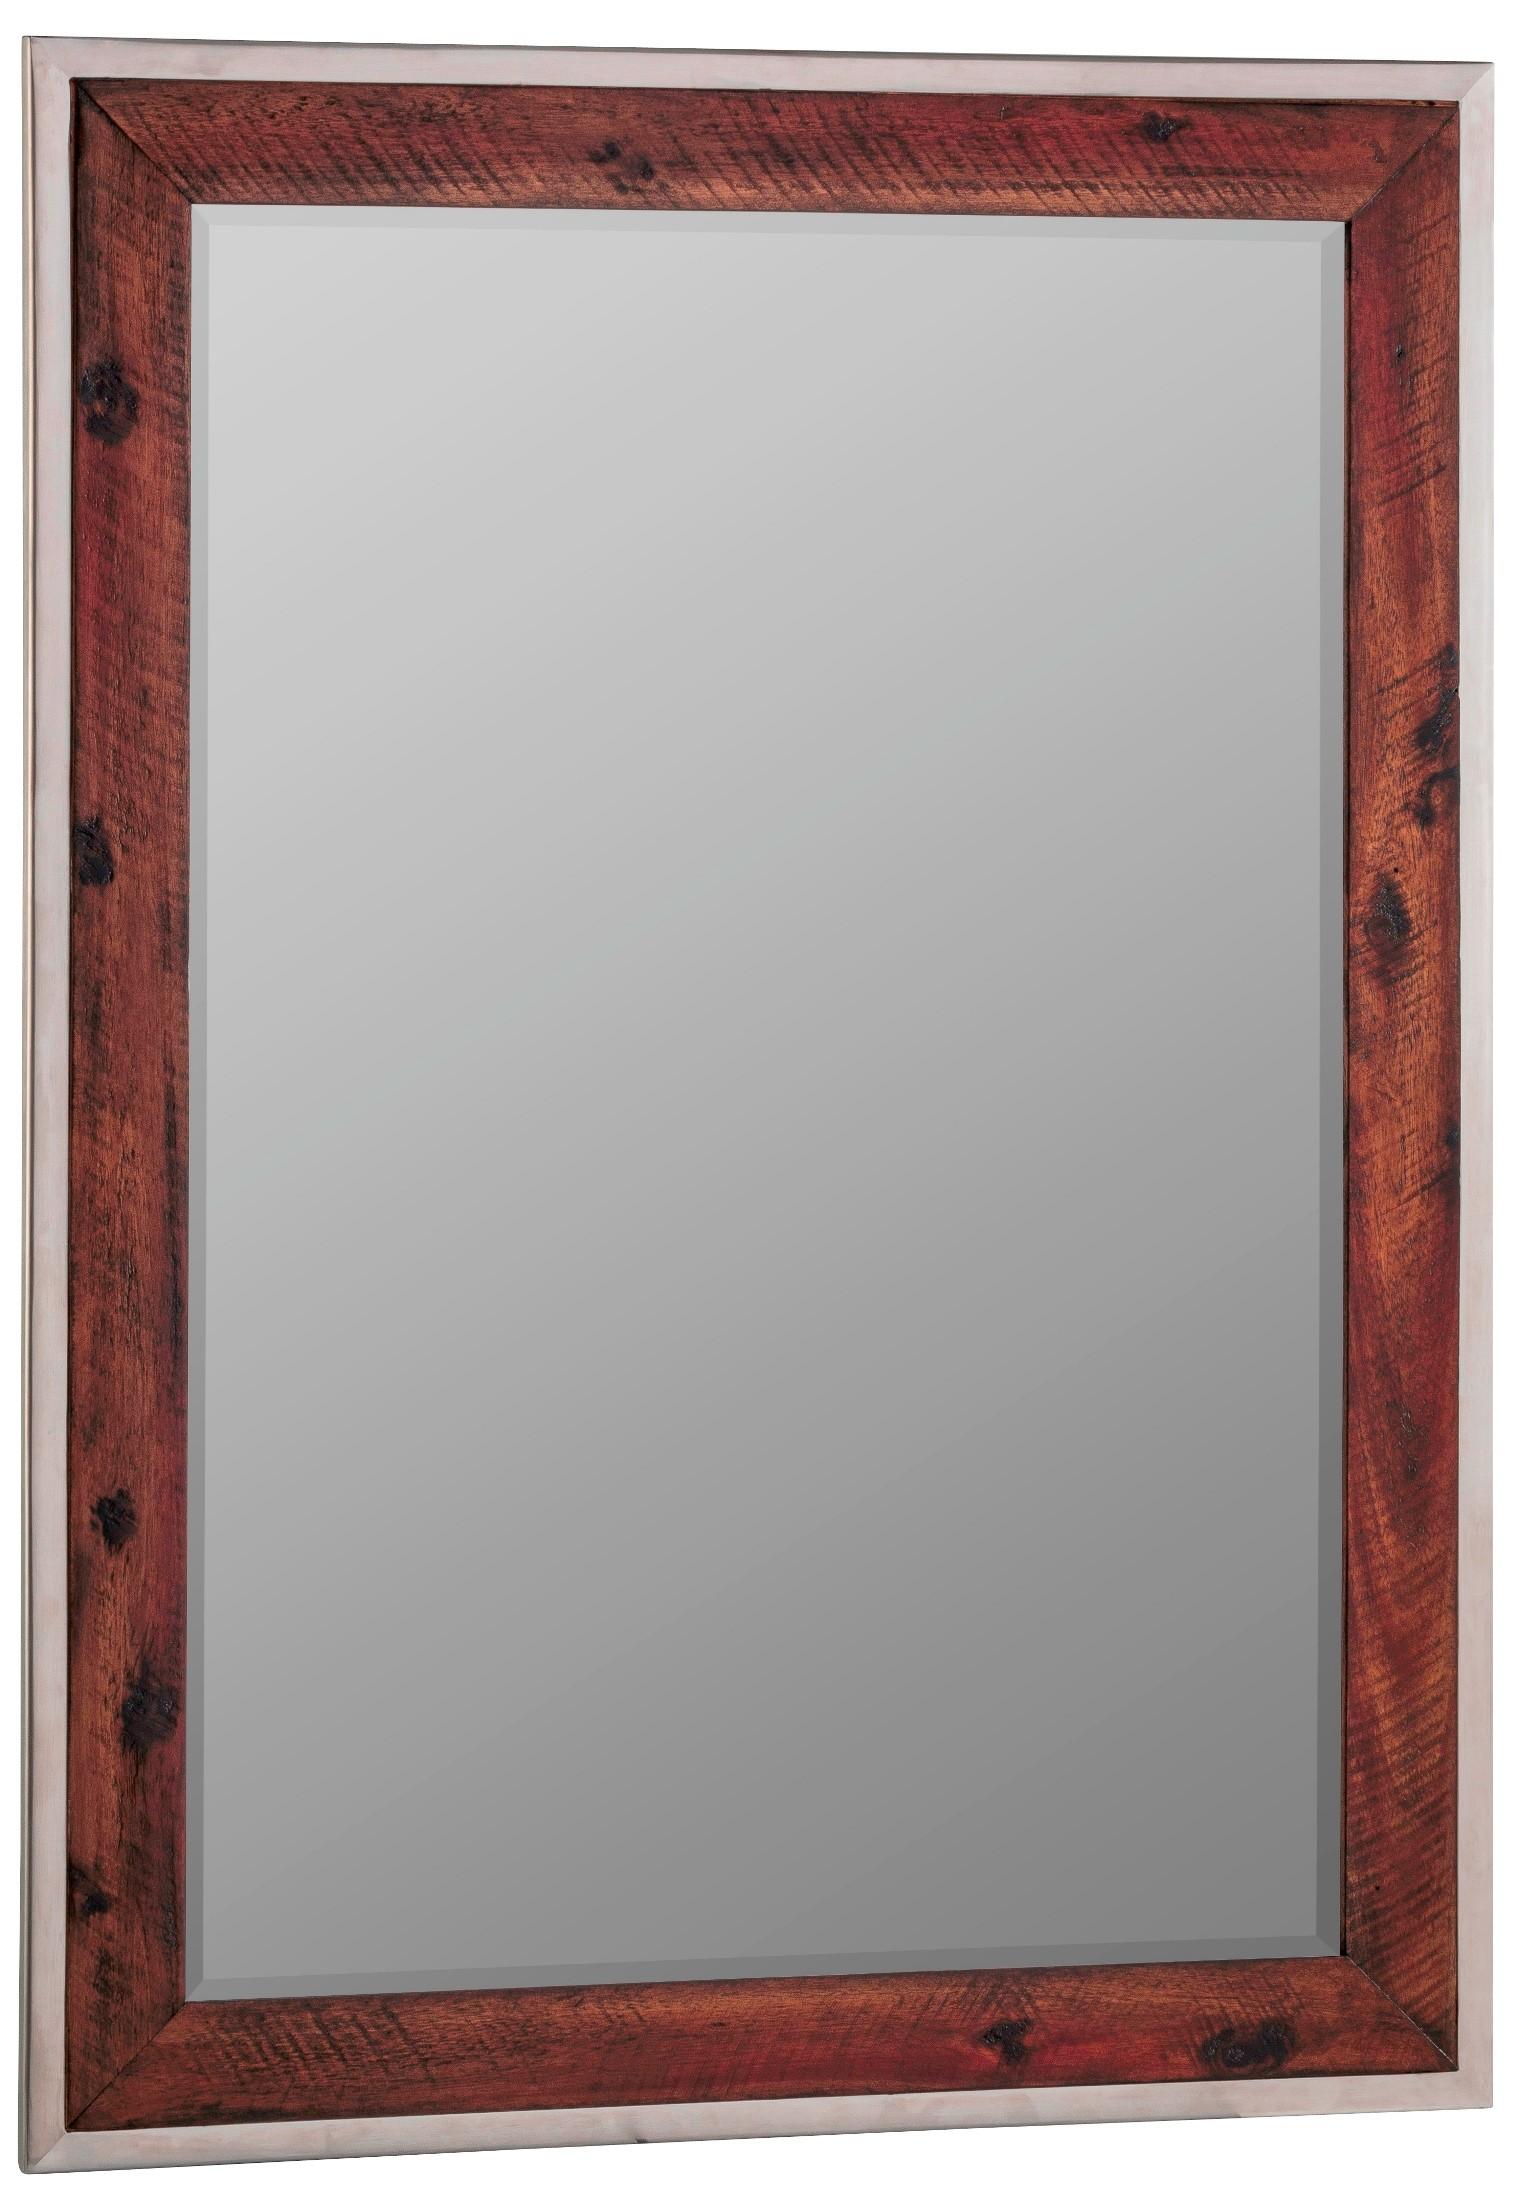 Clovis Stainless Steel Frame Mirror, 41076, Cooper Classics